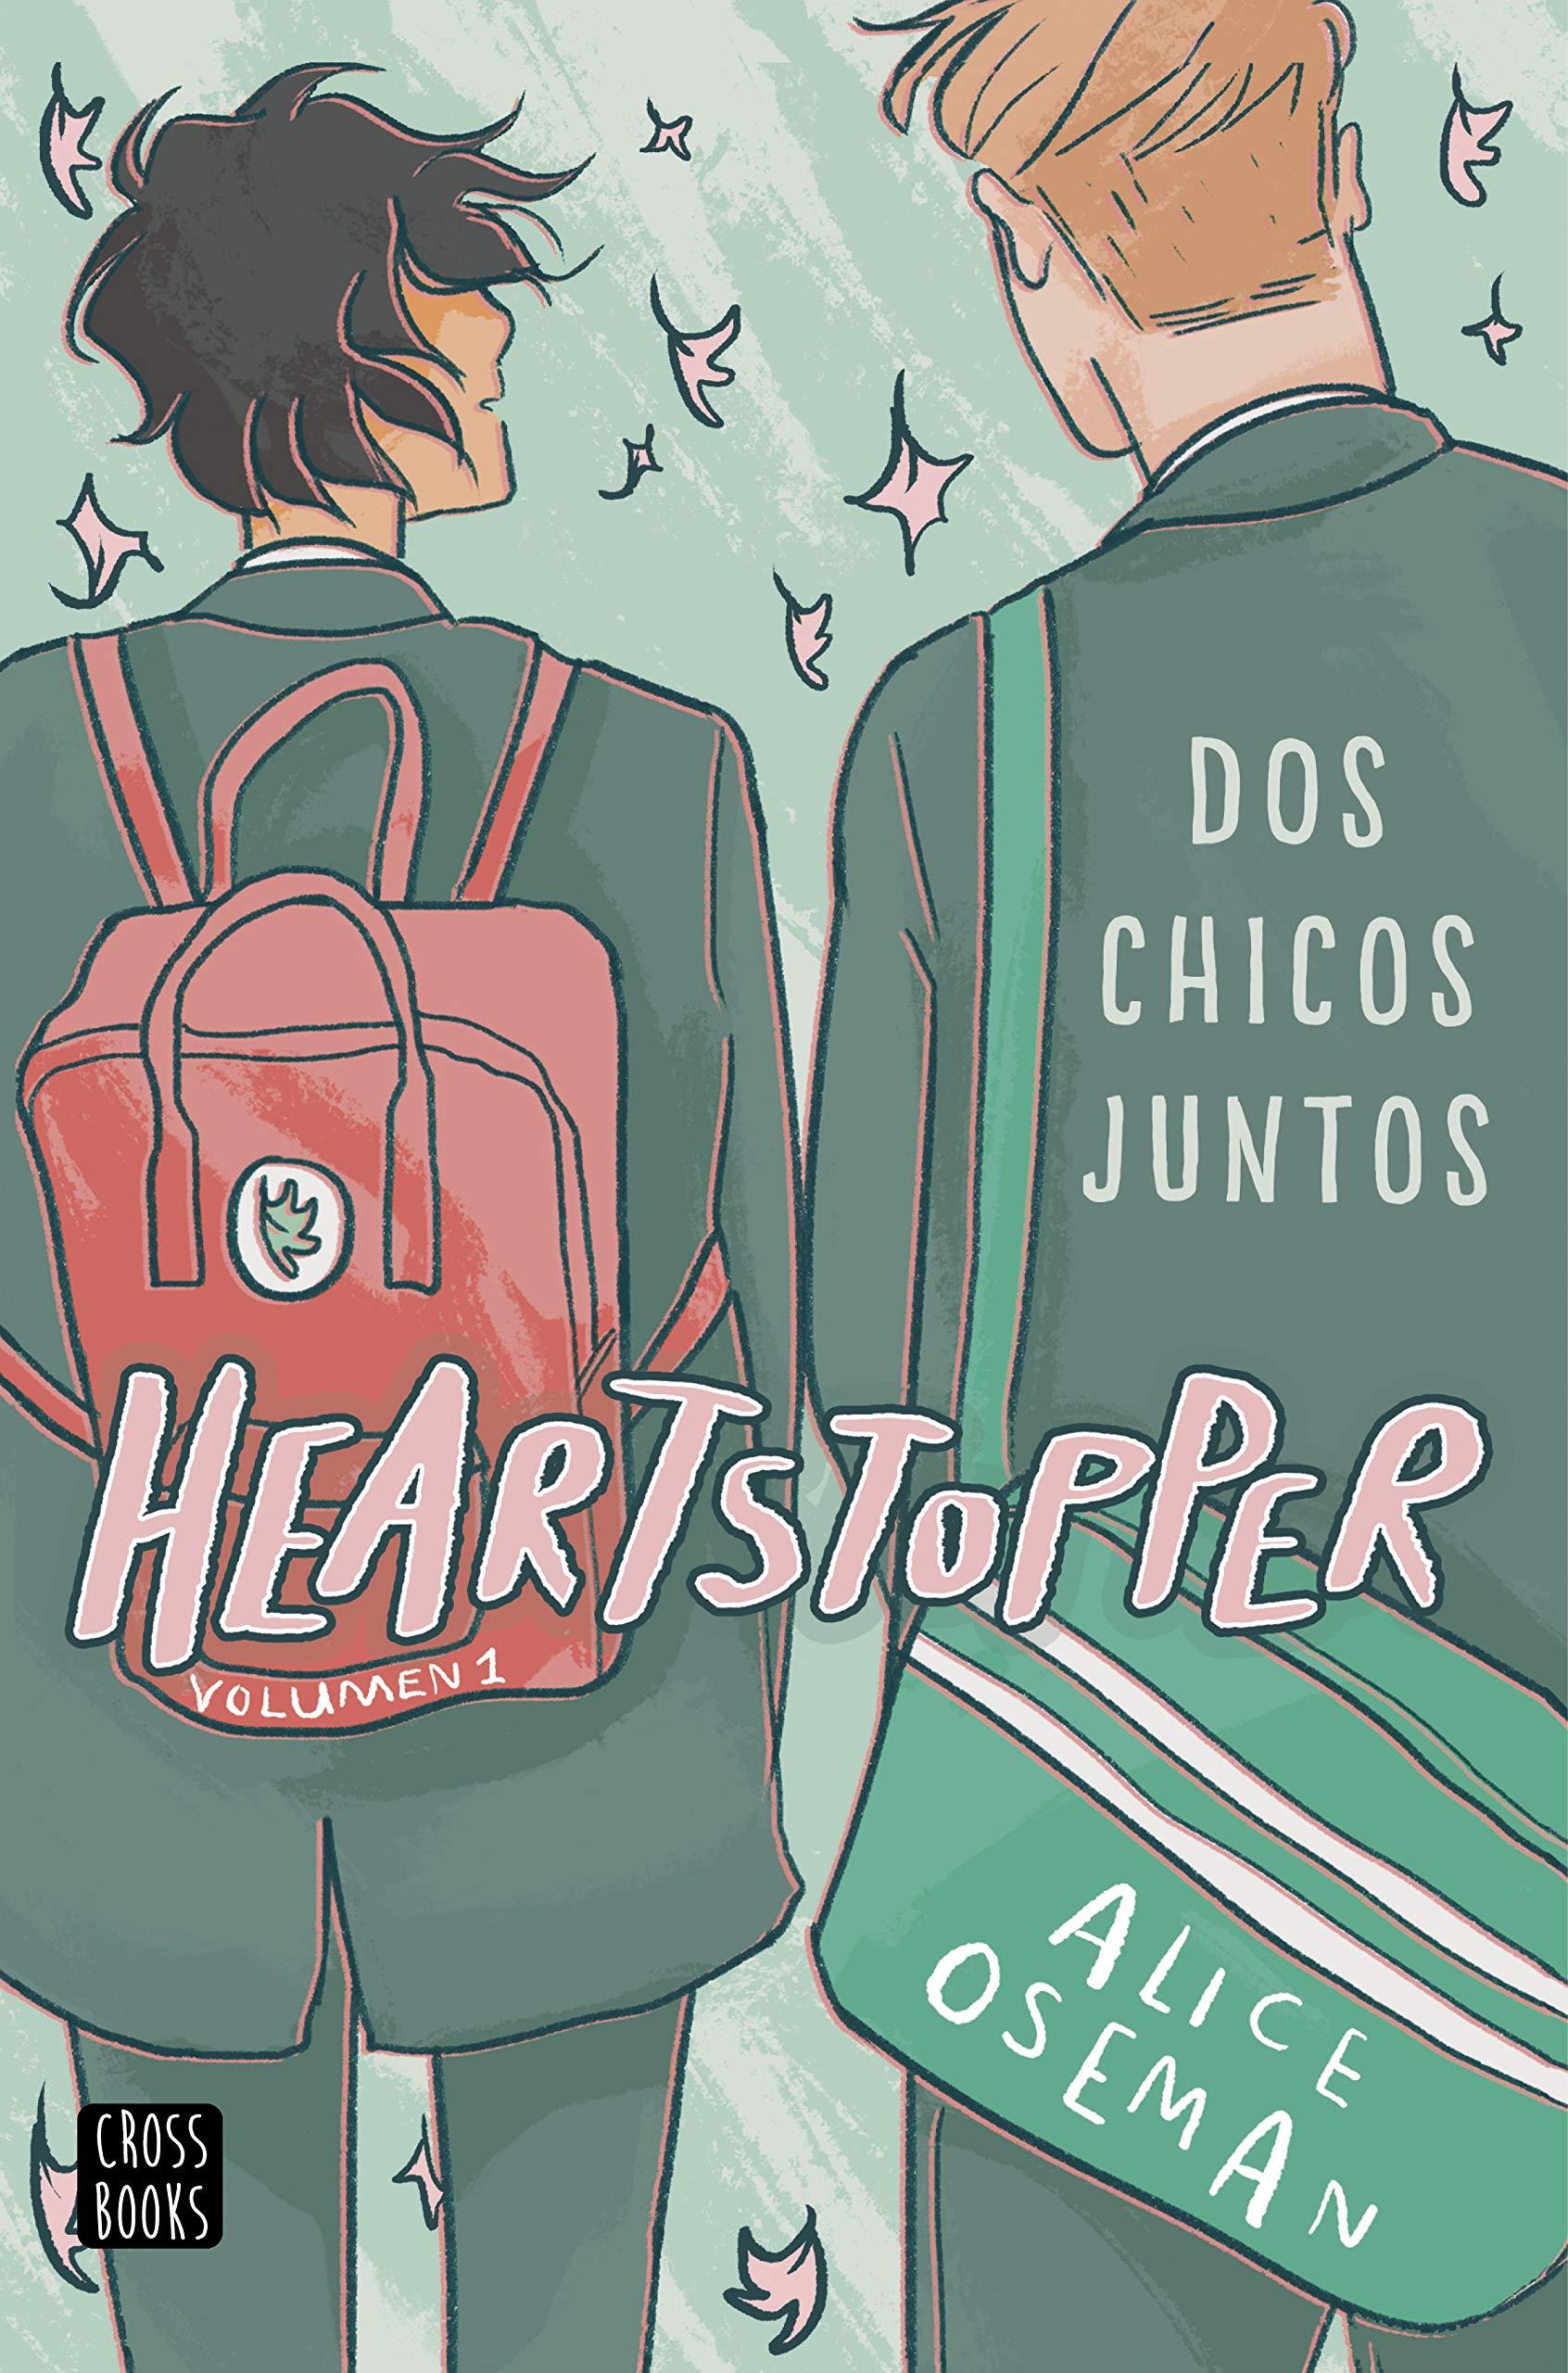 Heartstopper 1. Dos chicos juntos (Crossbooks)